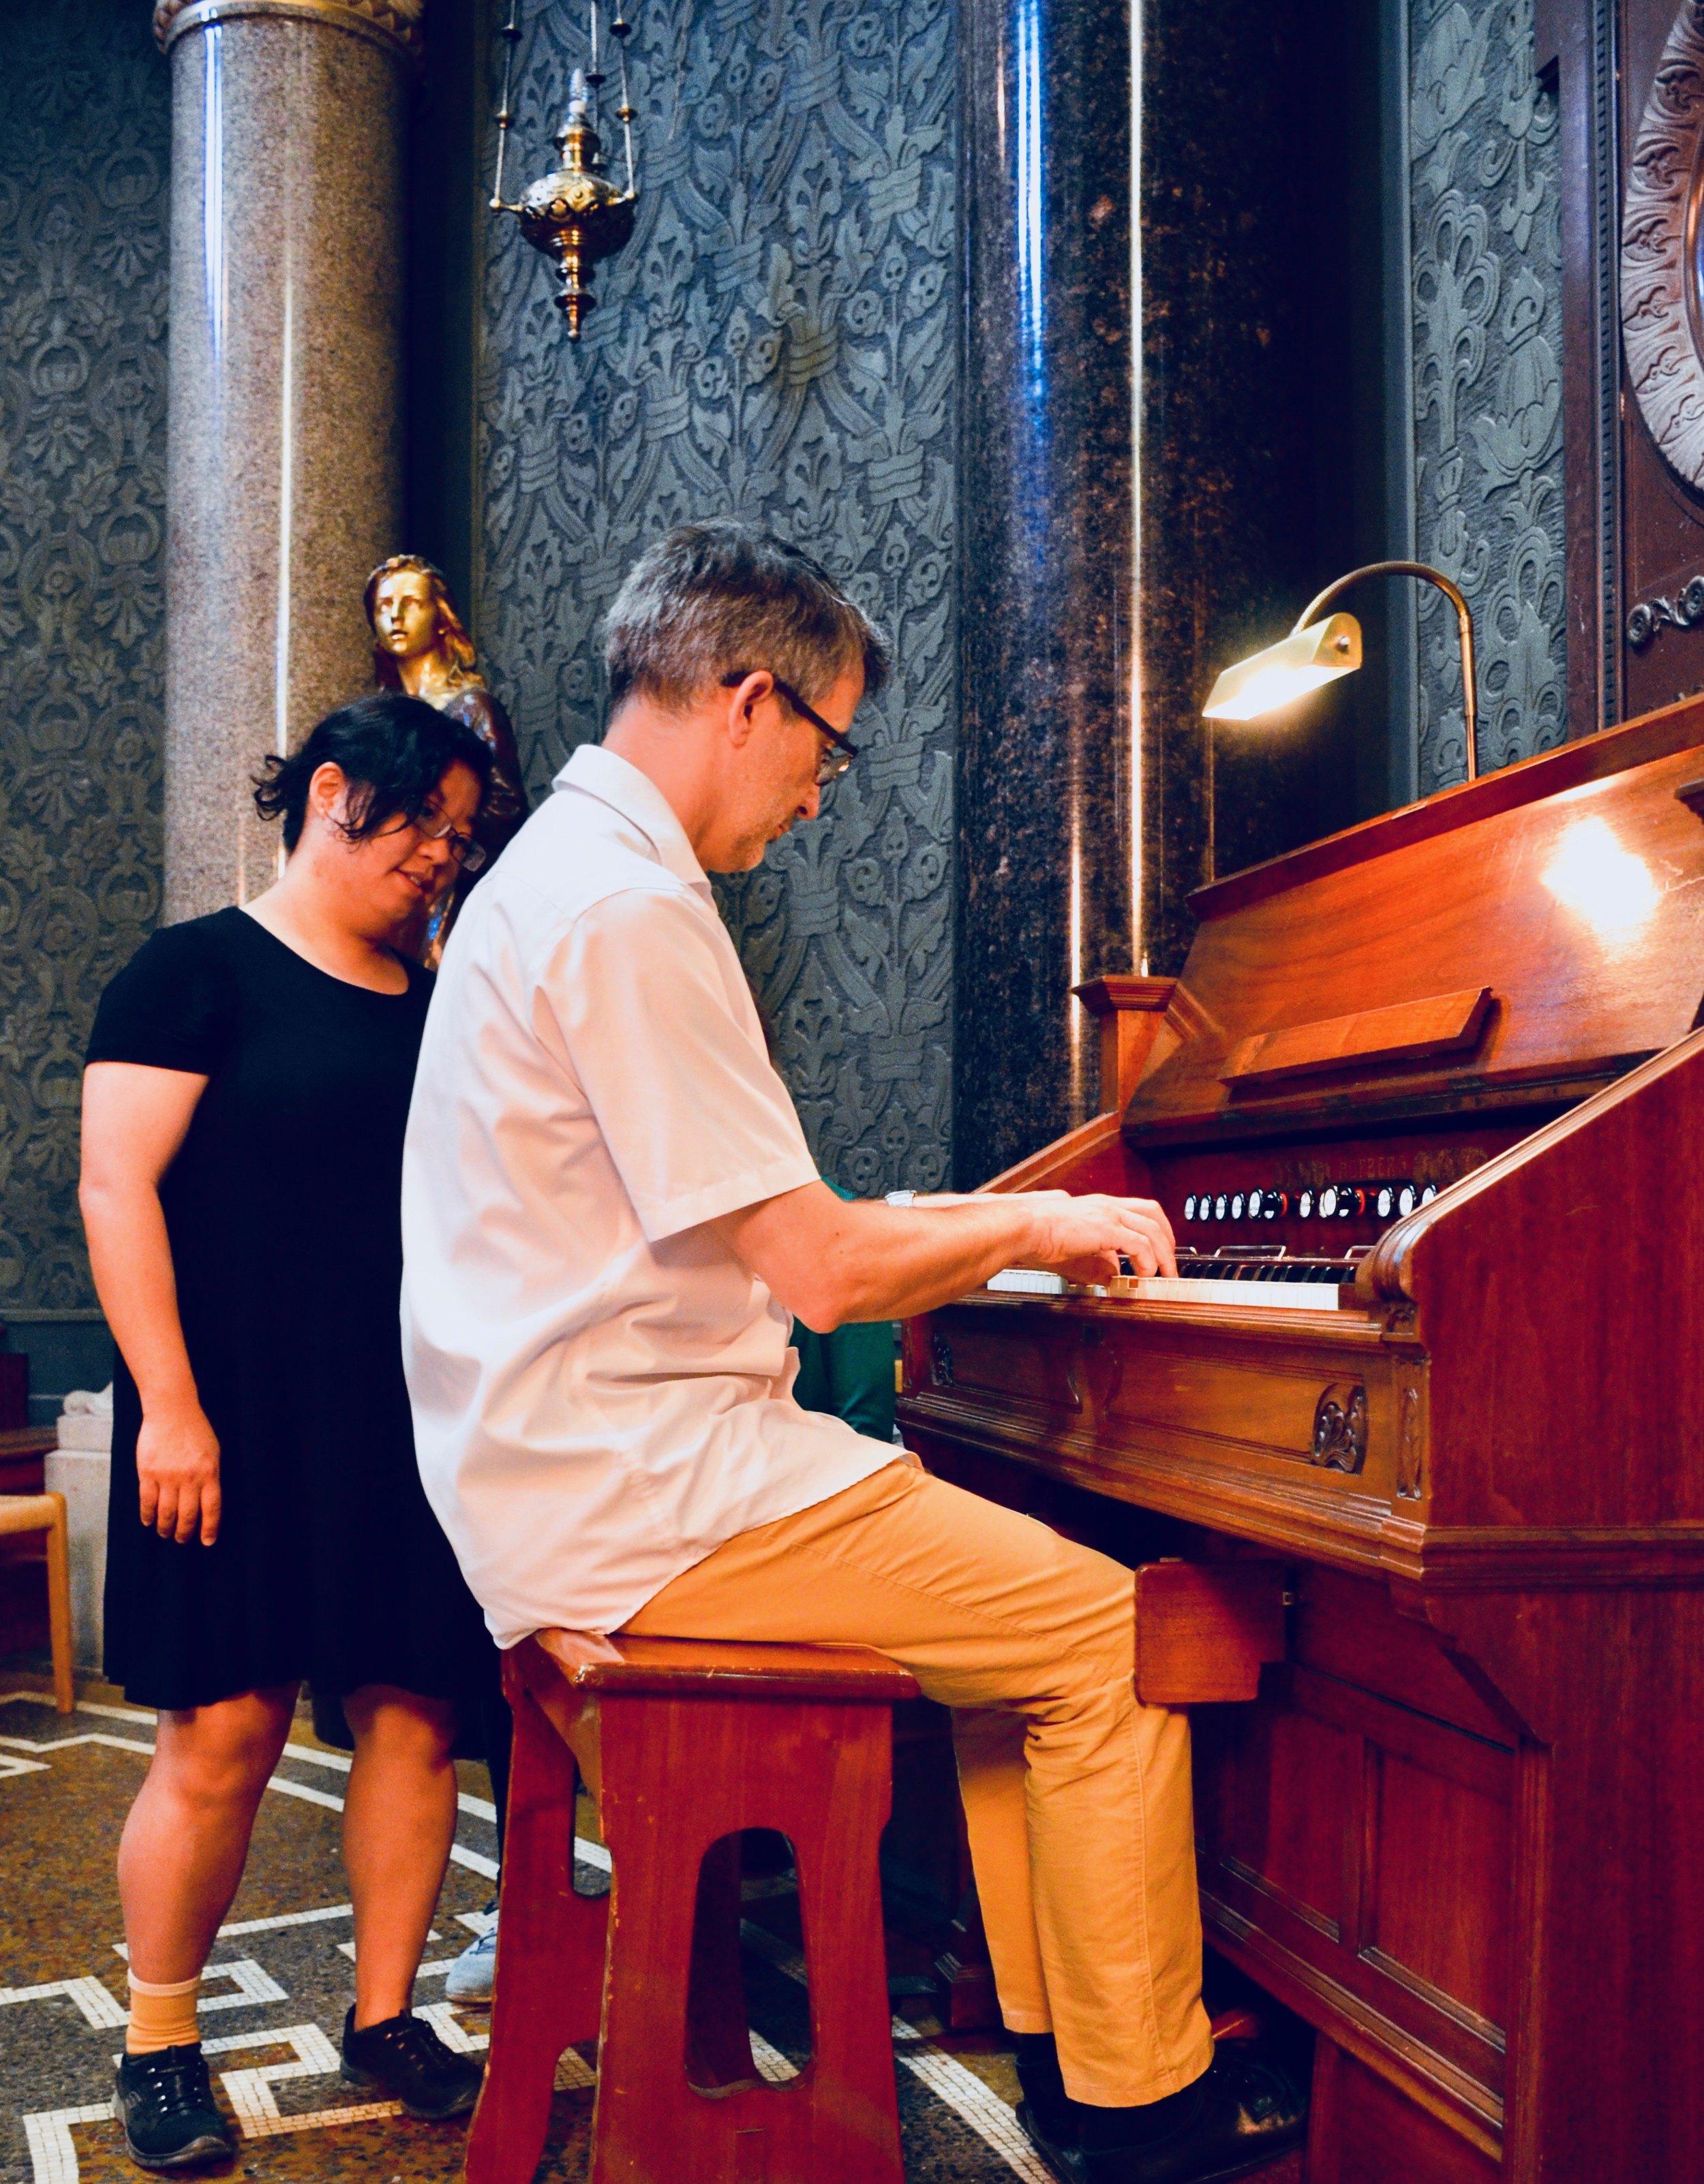 Sven Verner Olsen demonstrates one of Jesuskirke's 46 harmoniums.